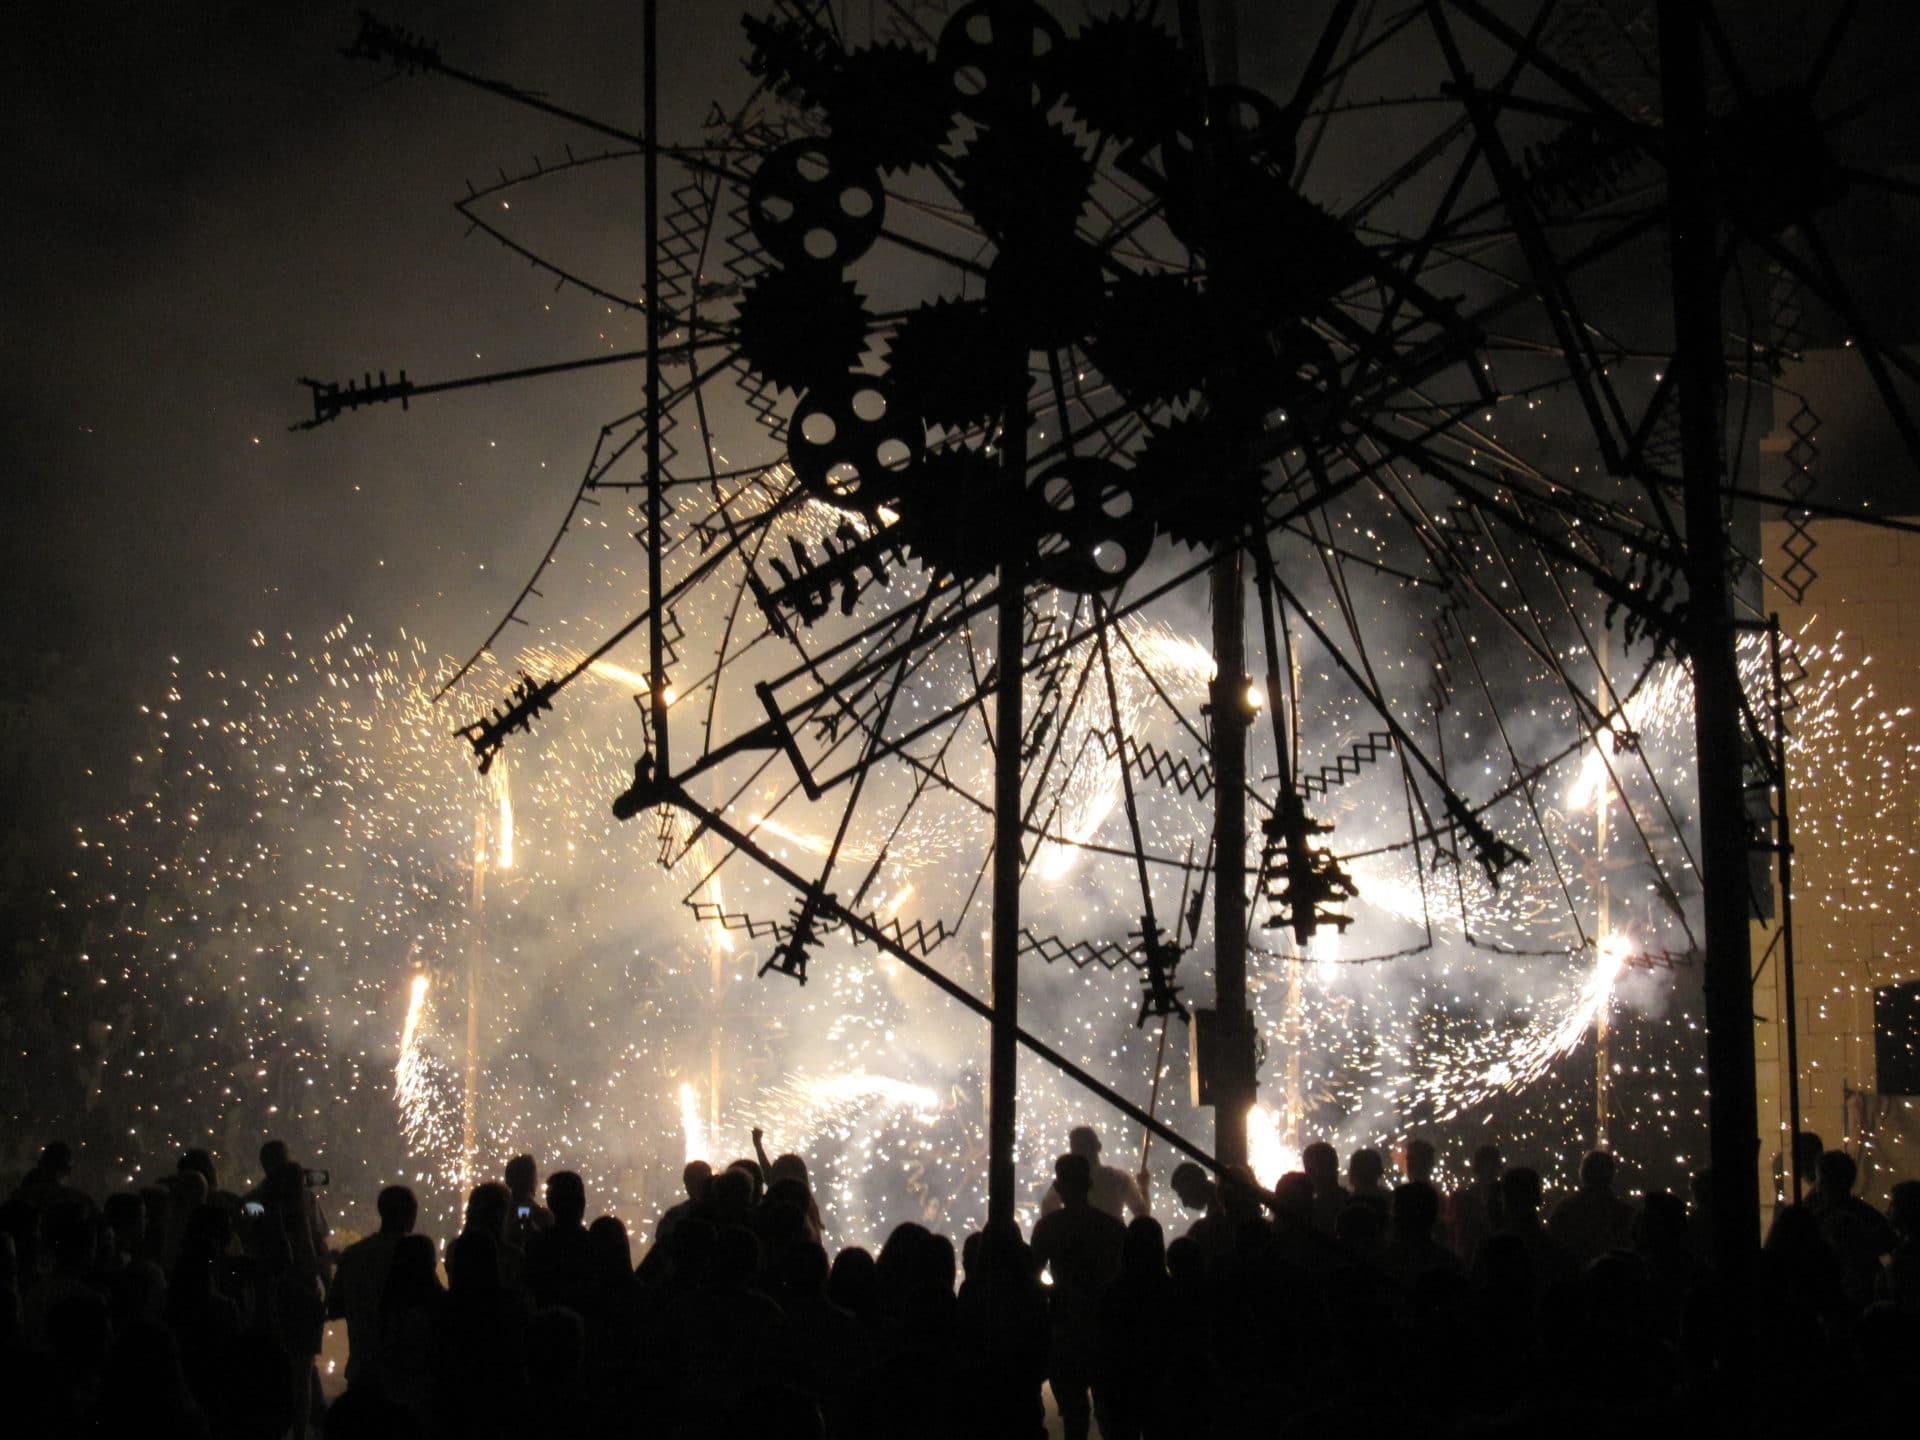 Fireworks for a festival in Gozo